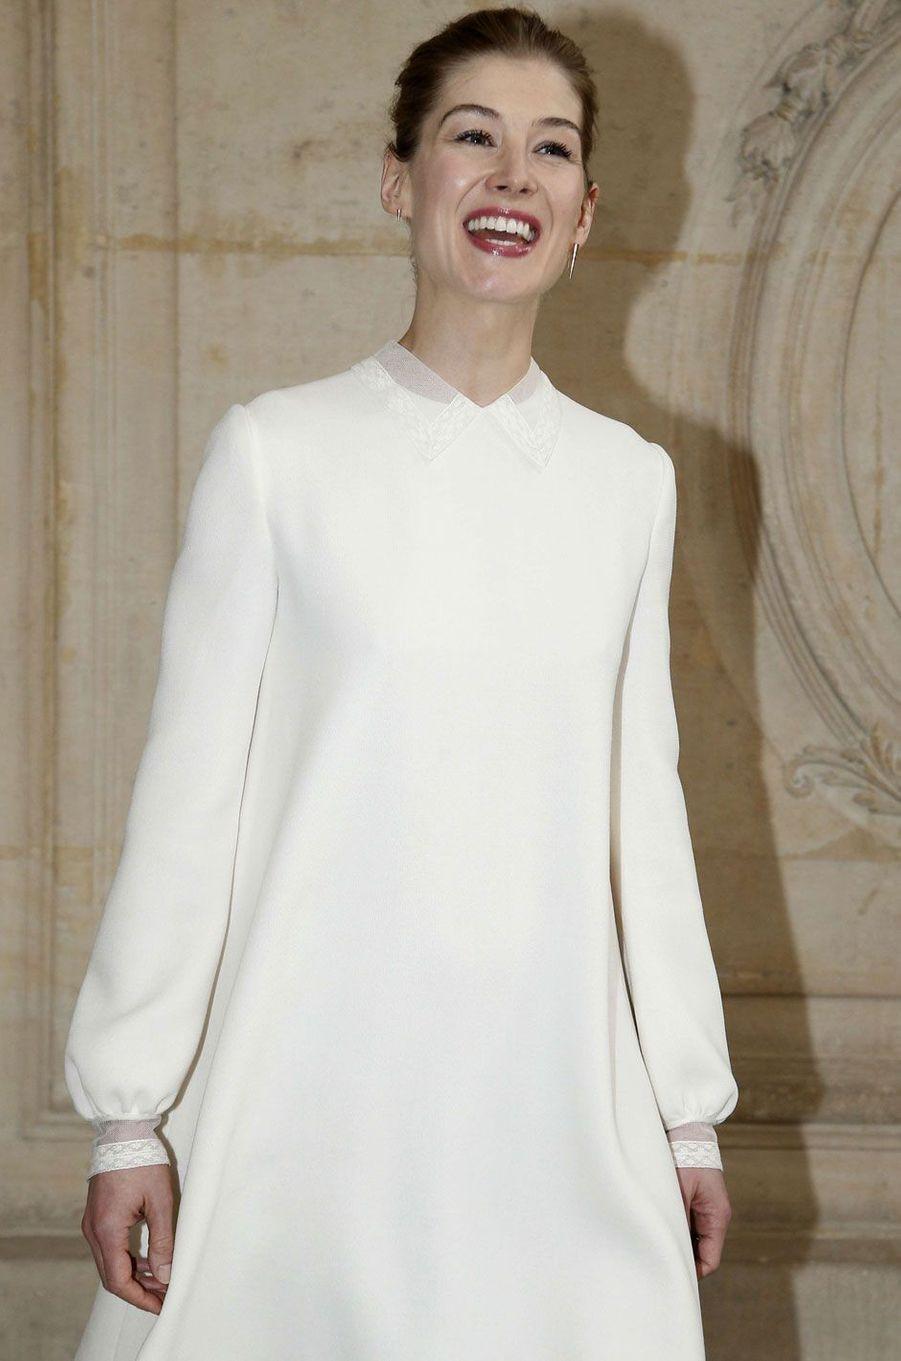 L'actrice Rosamund Pike au défilé Christian Dior.